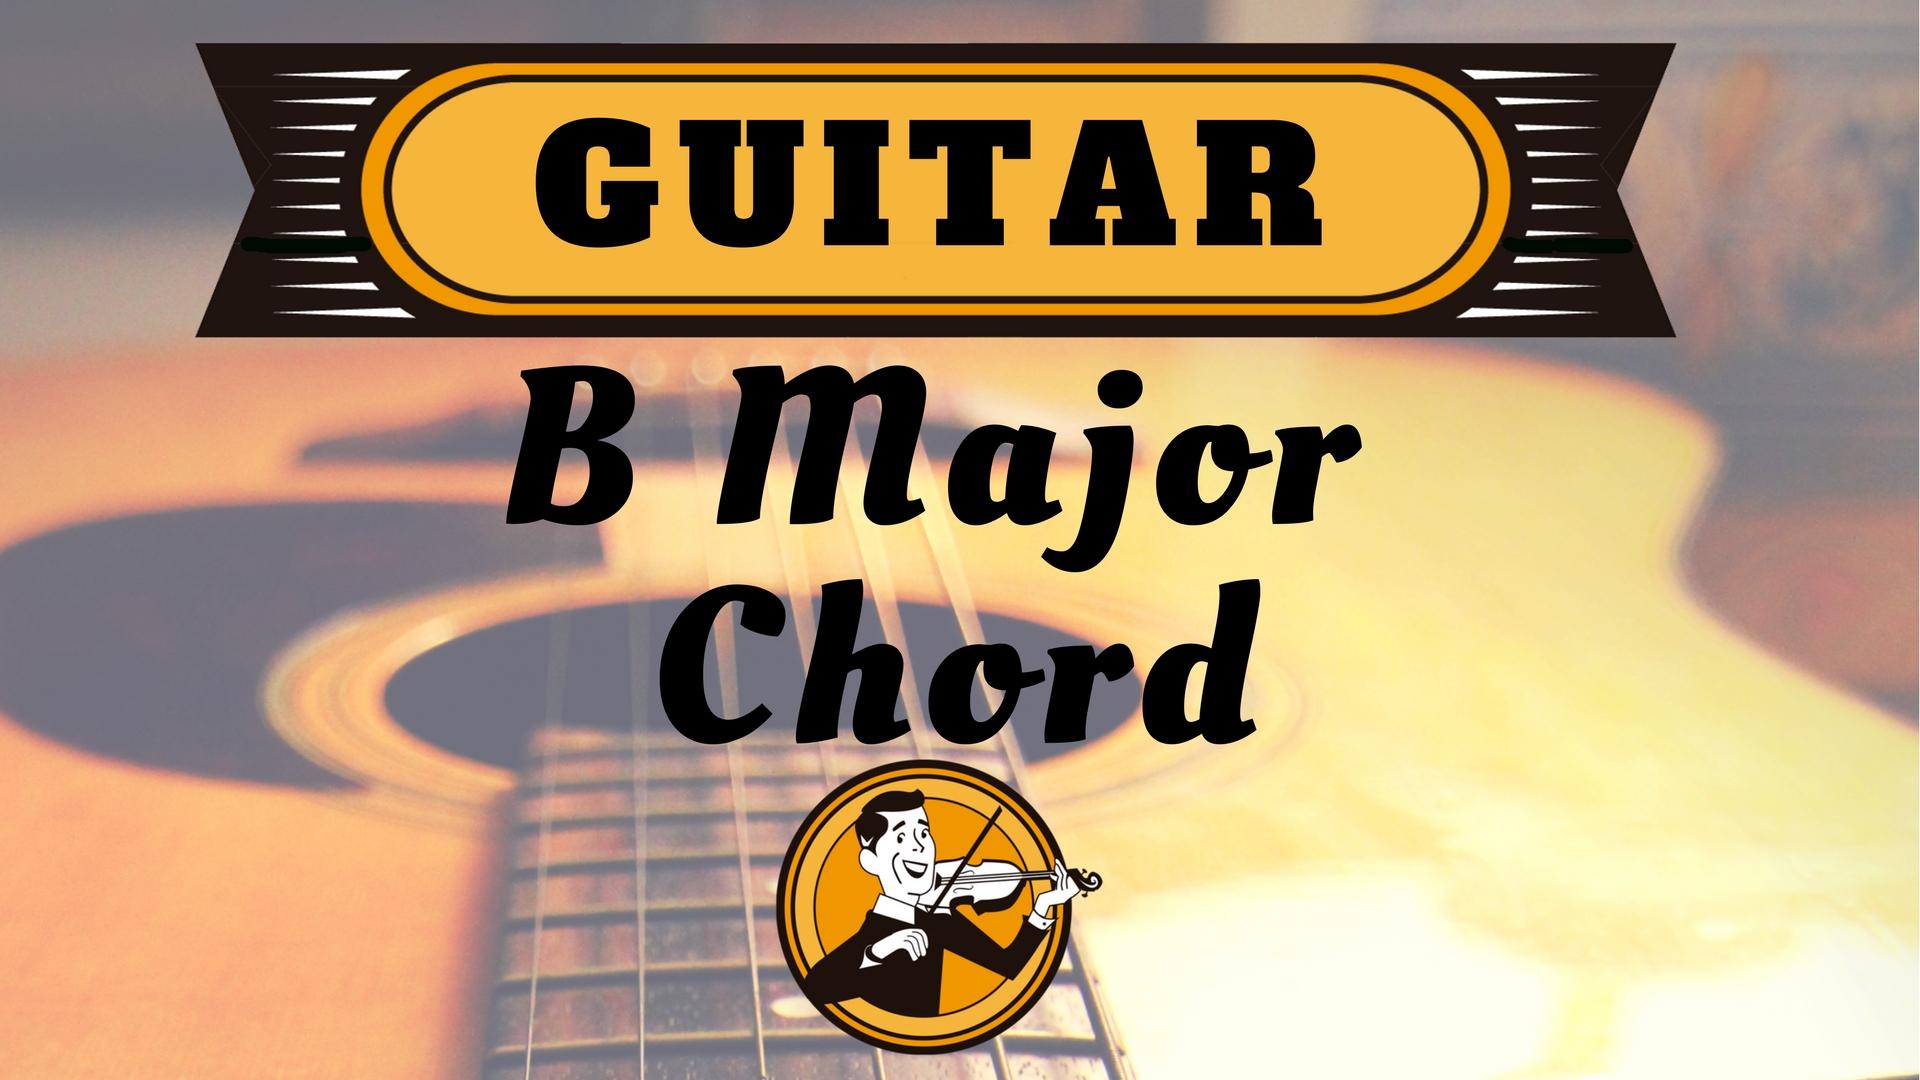 Fiddlin Mike Chords B Major Chord 333